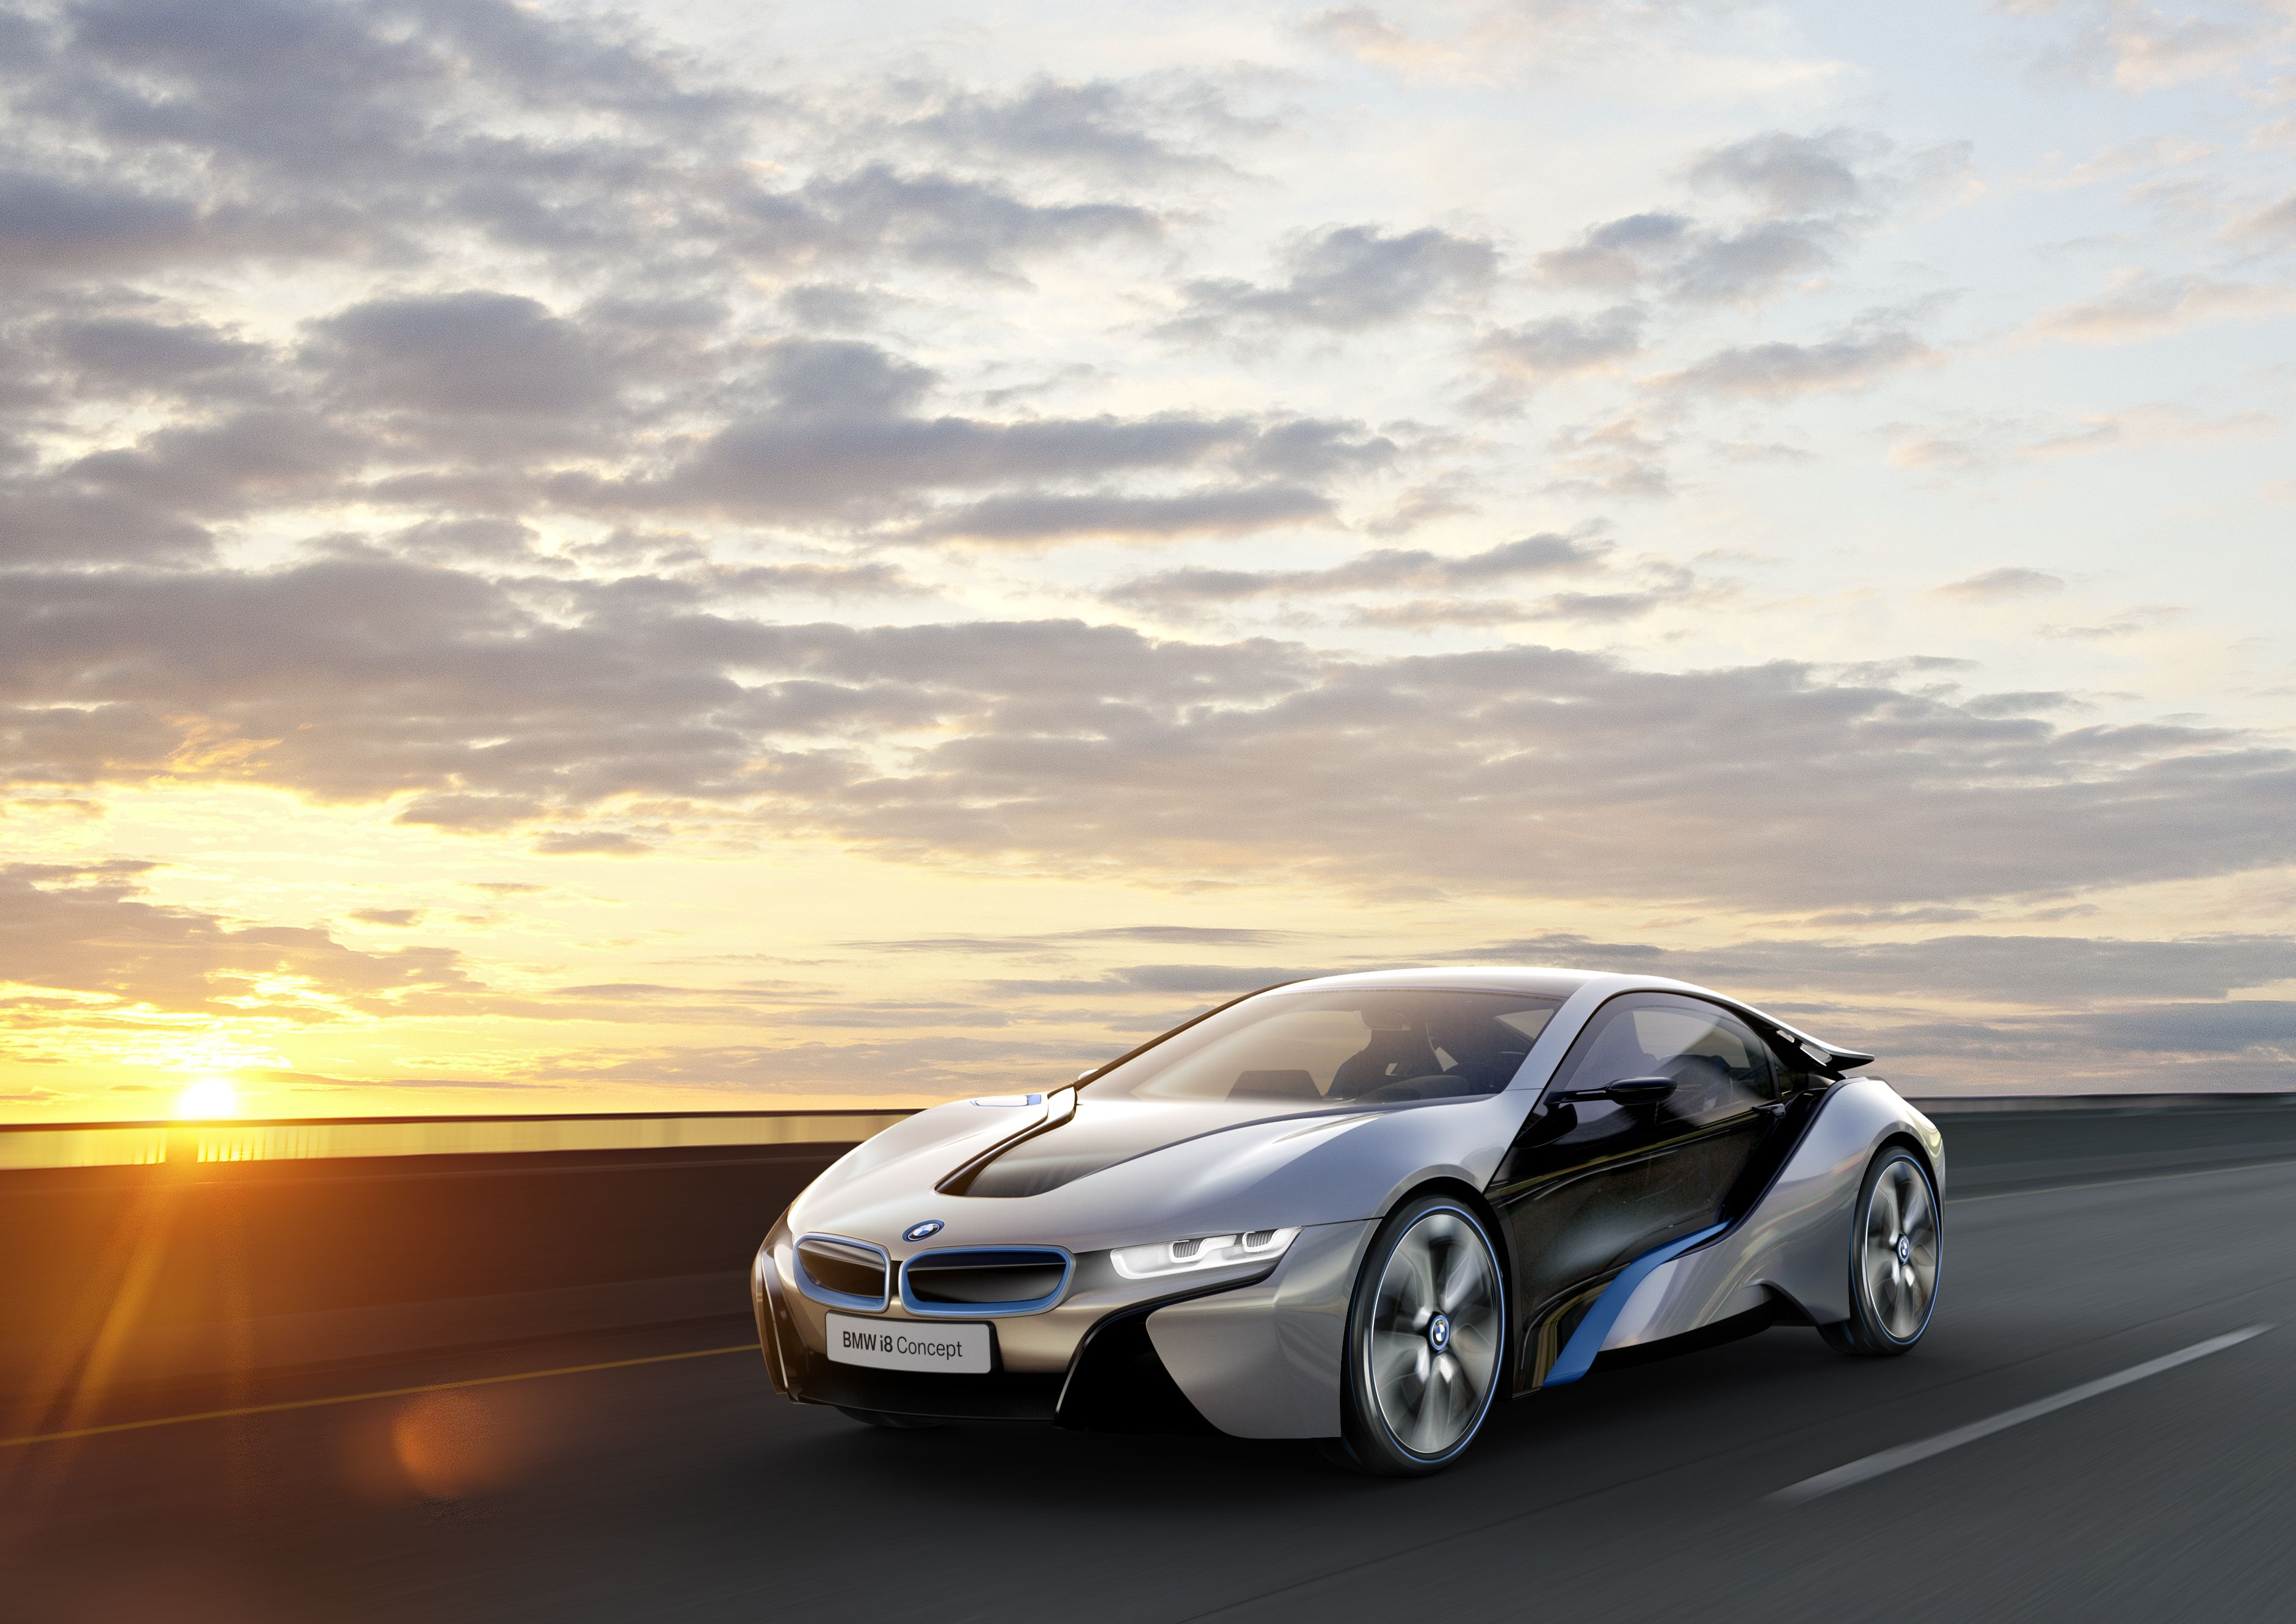 Bmw I8 Concept Edrive Burn Electric Sheerdrivingpleasure Iperformance Fresh Air Green City Provoc Bmw I8 Sports Cars Luxury Best Luxury Sports Car